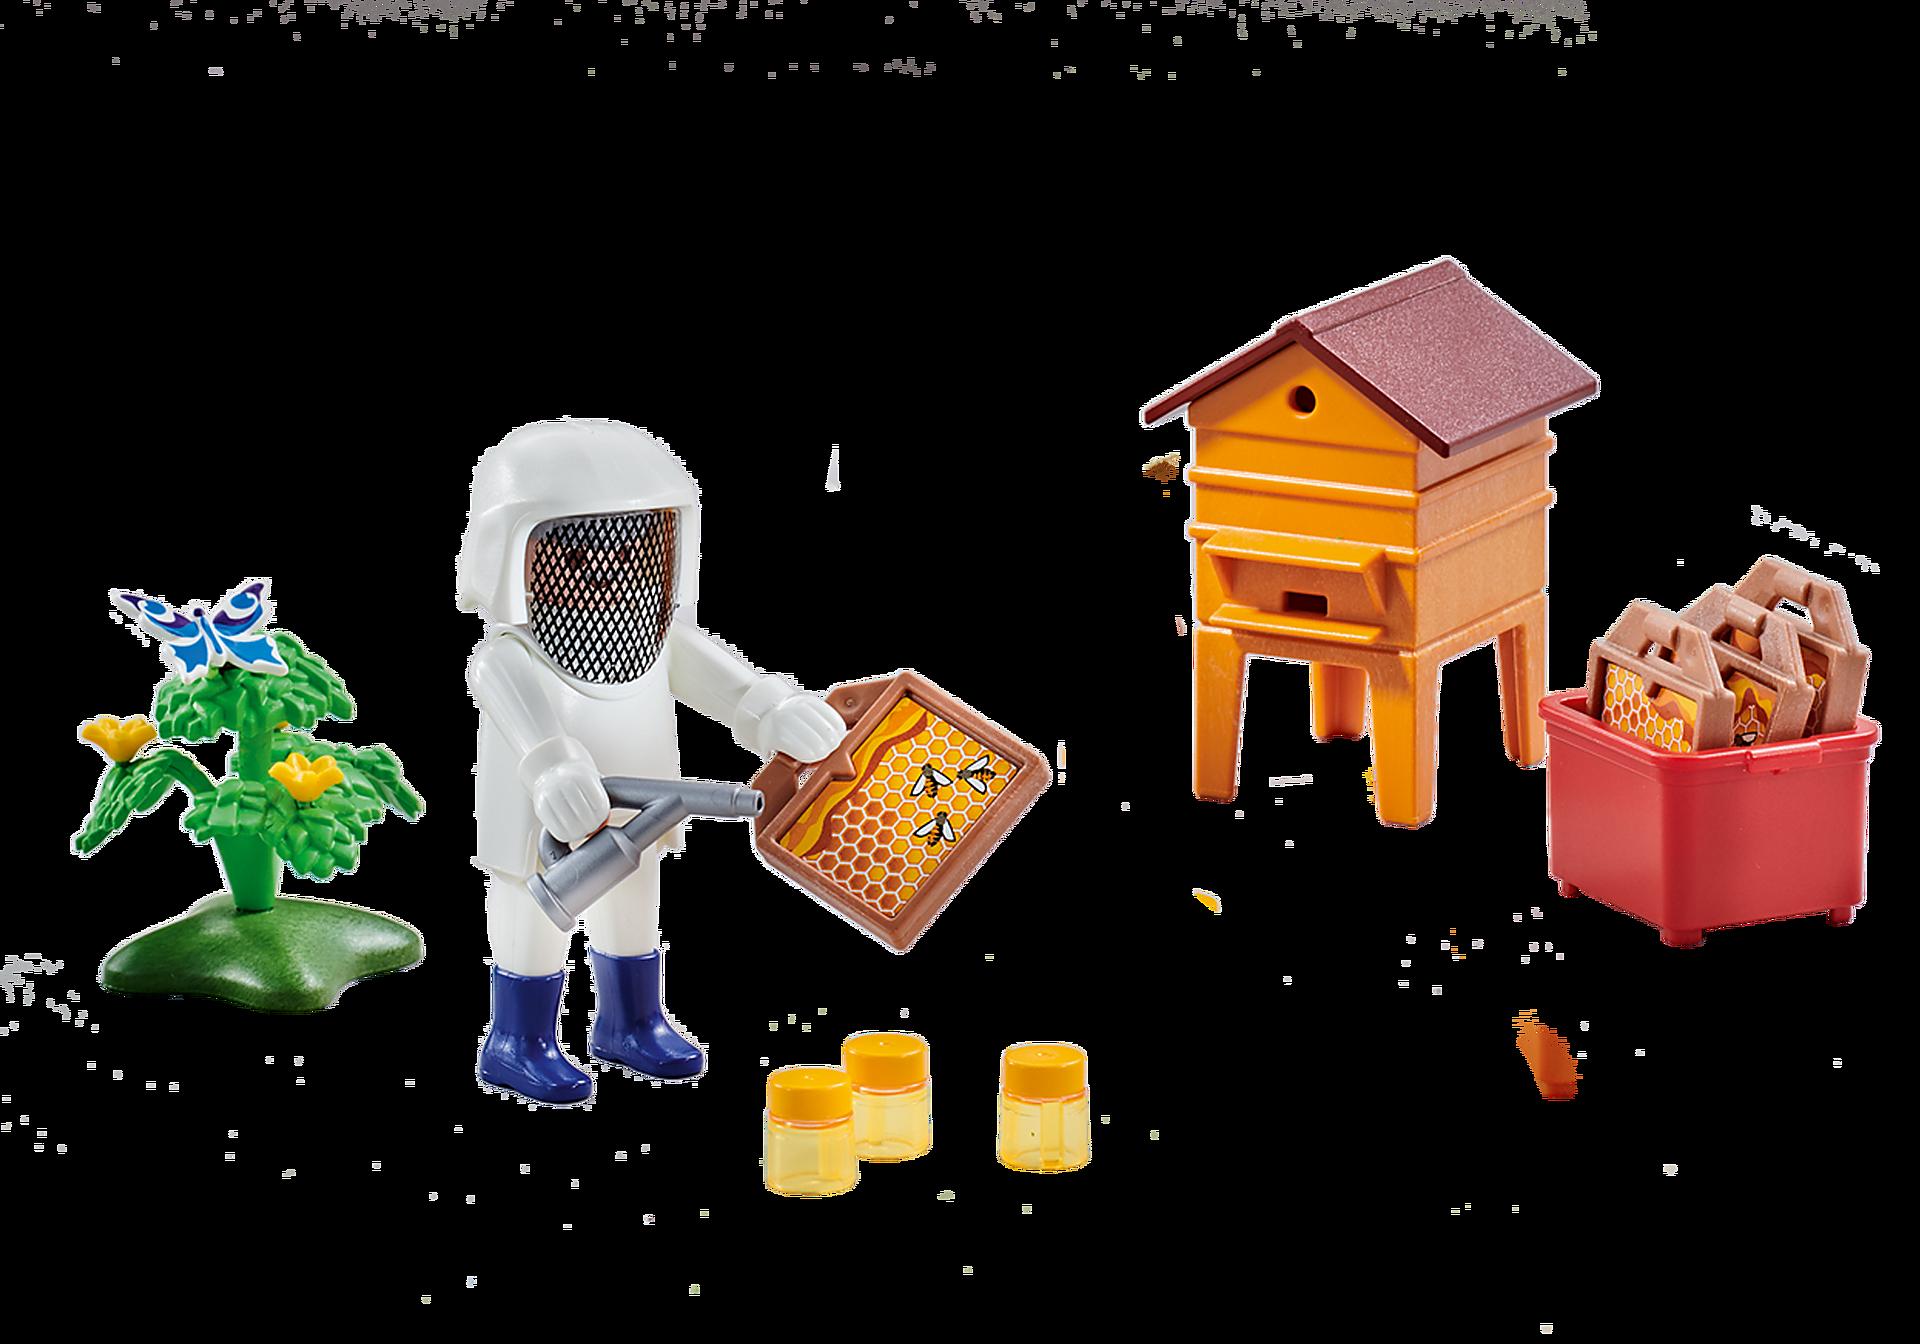 6573 Beekeeper with Hive zoom image1